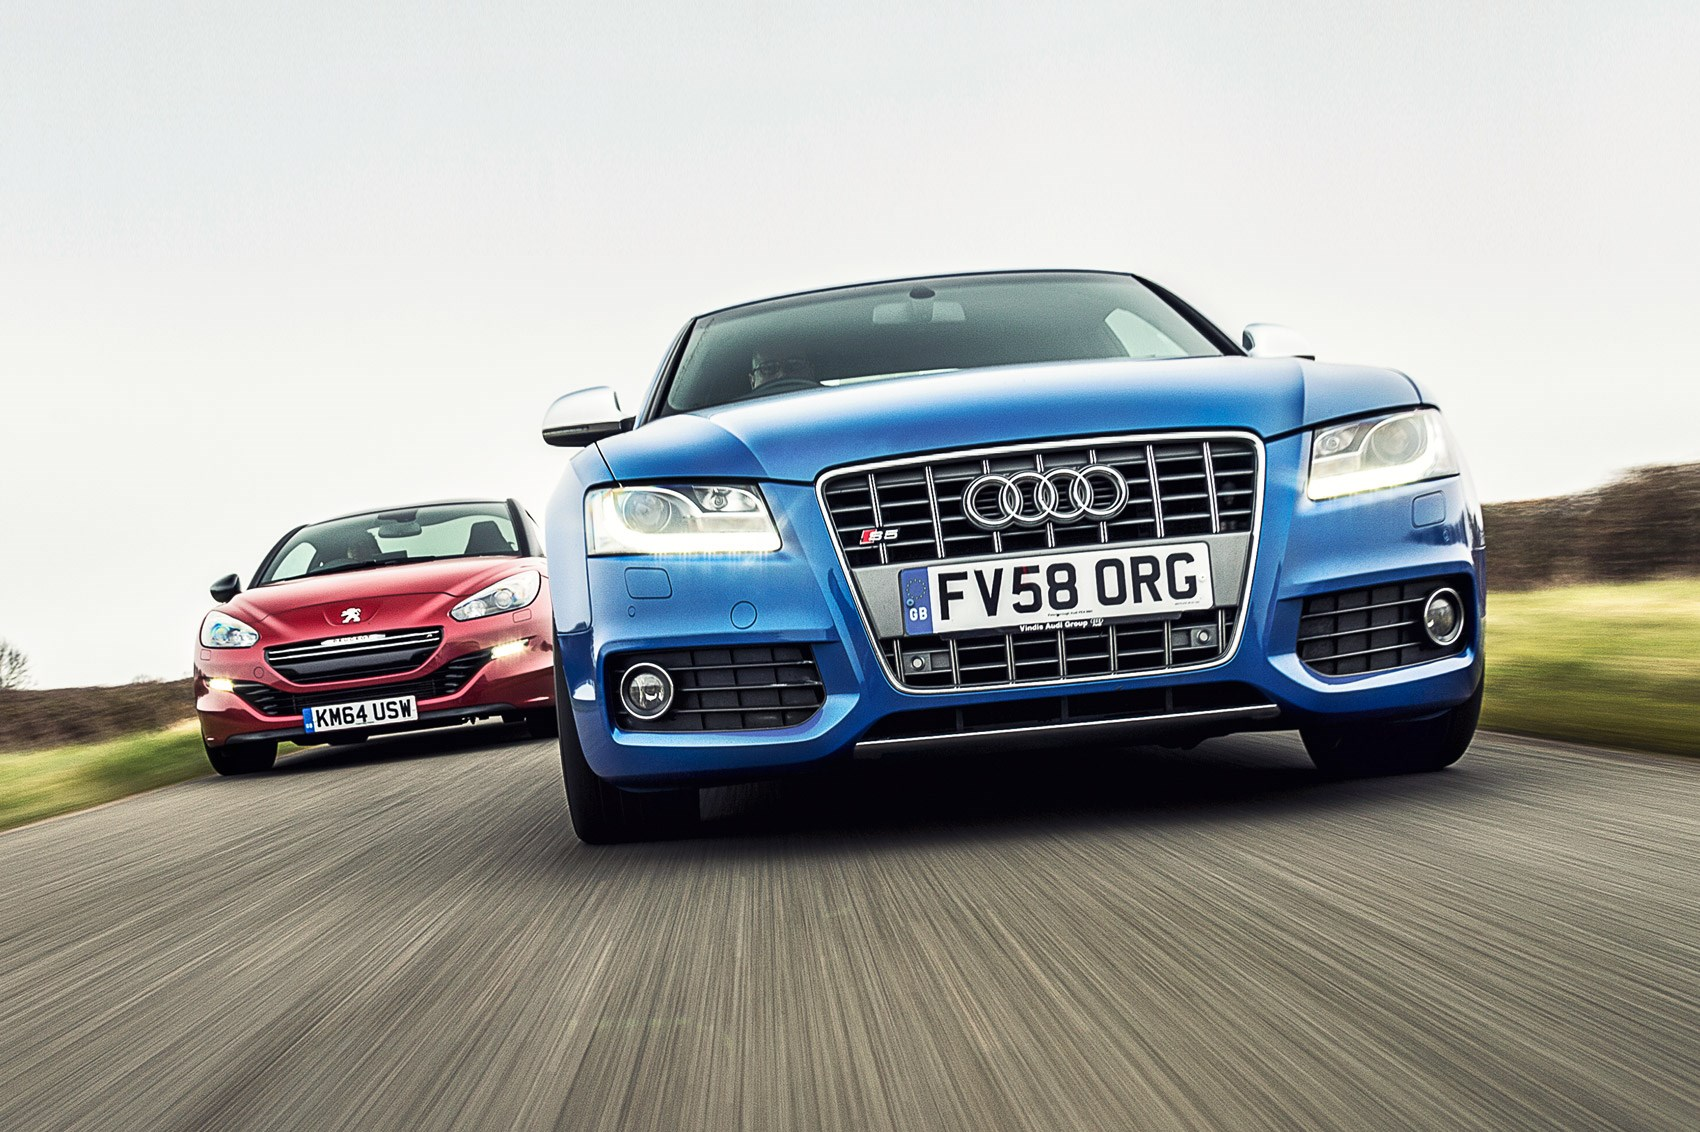 used cars vs new cars essay